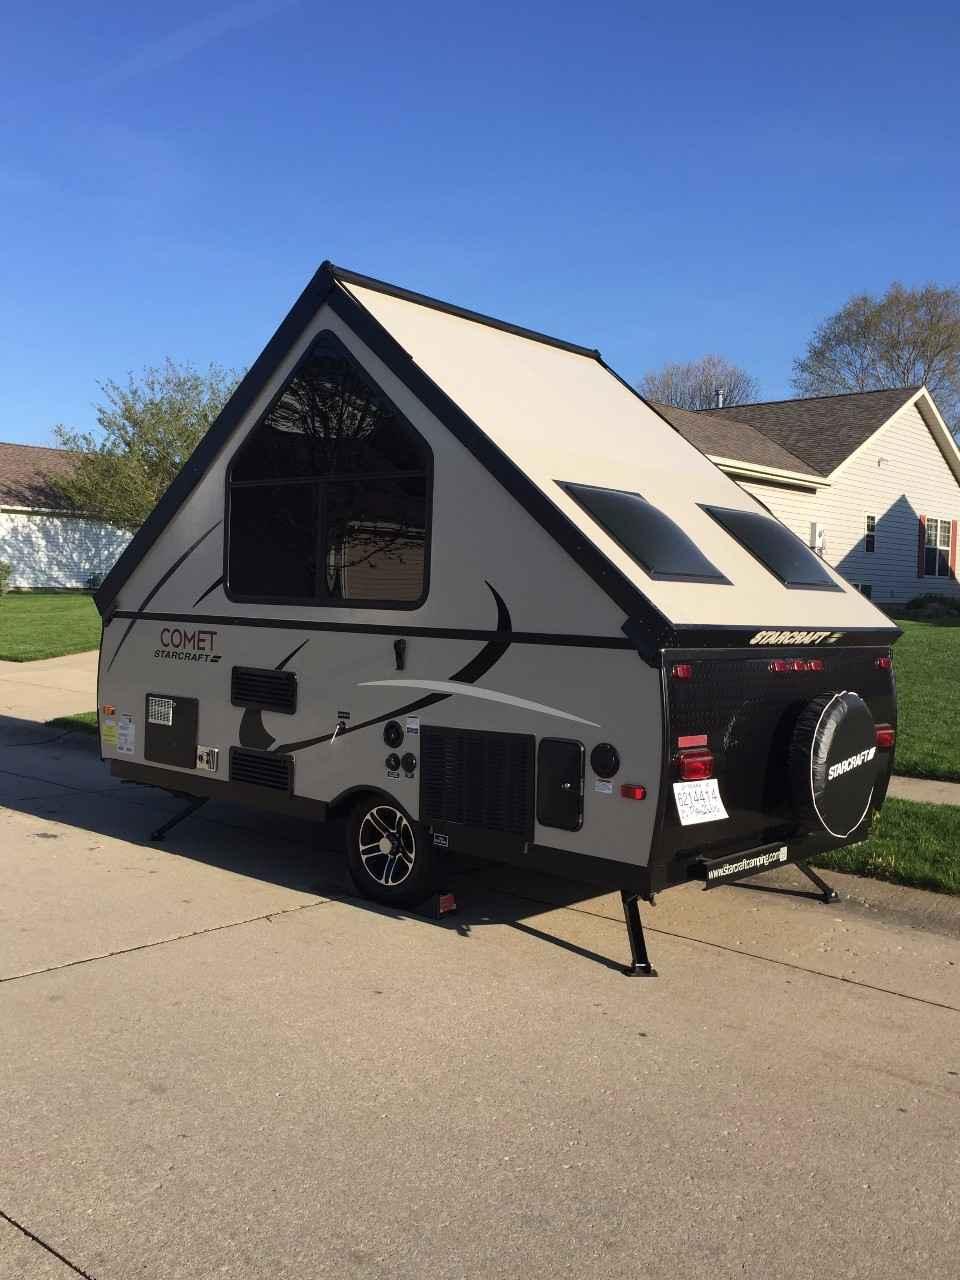 959fcbe597 2016 Used COMET Pop Up Camper in Indiana IN